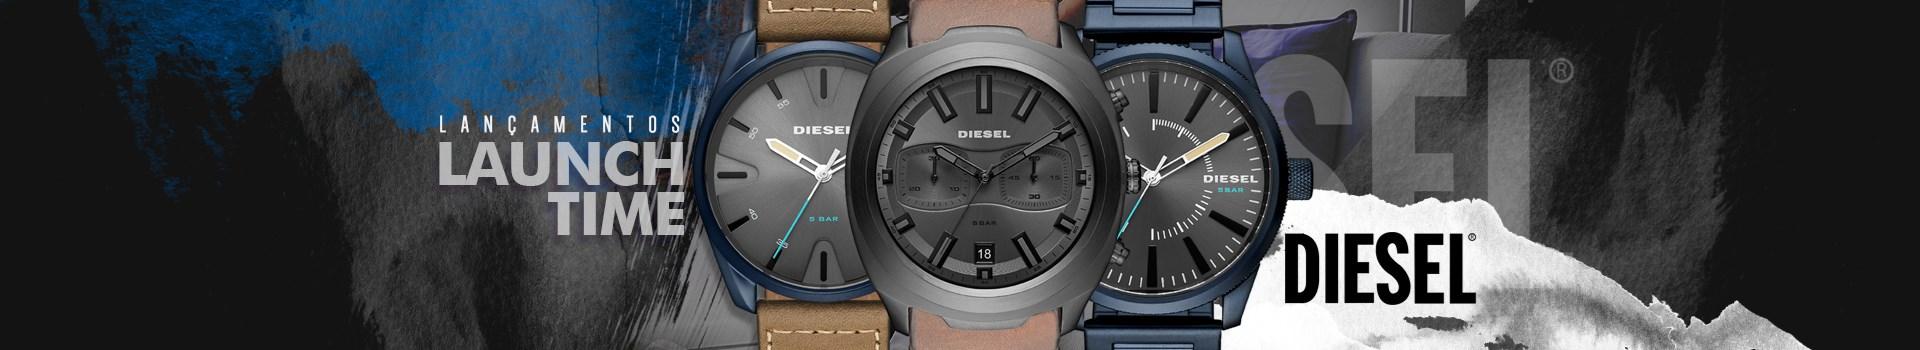 Lançamentos Diesel